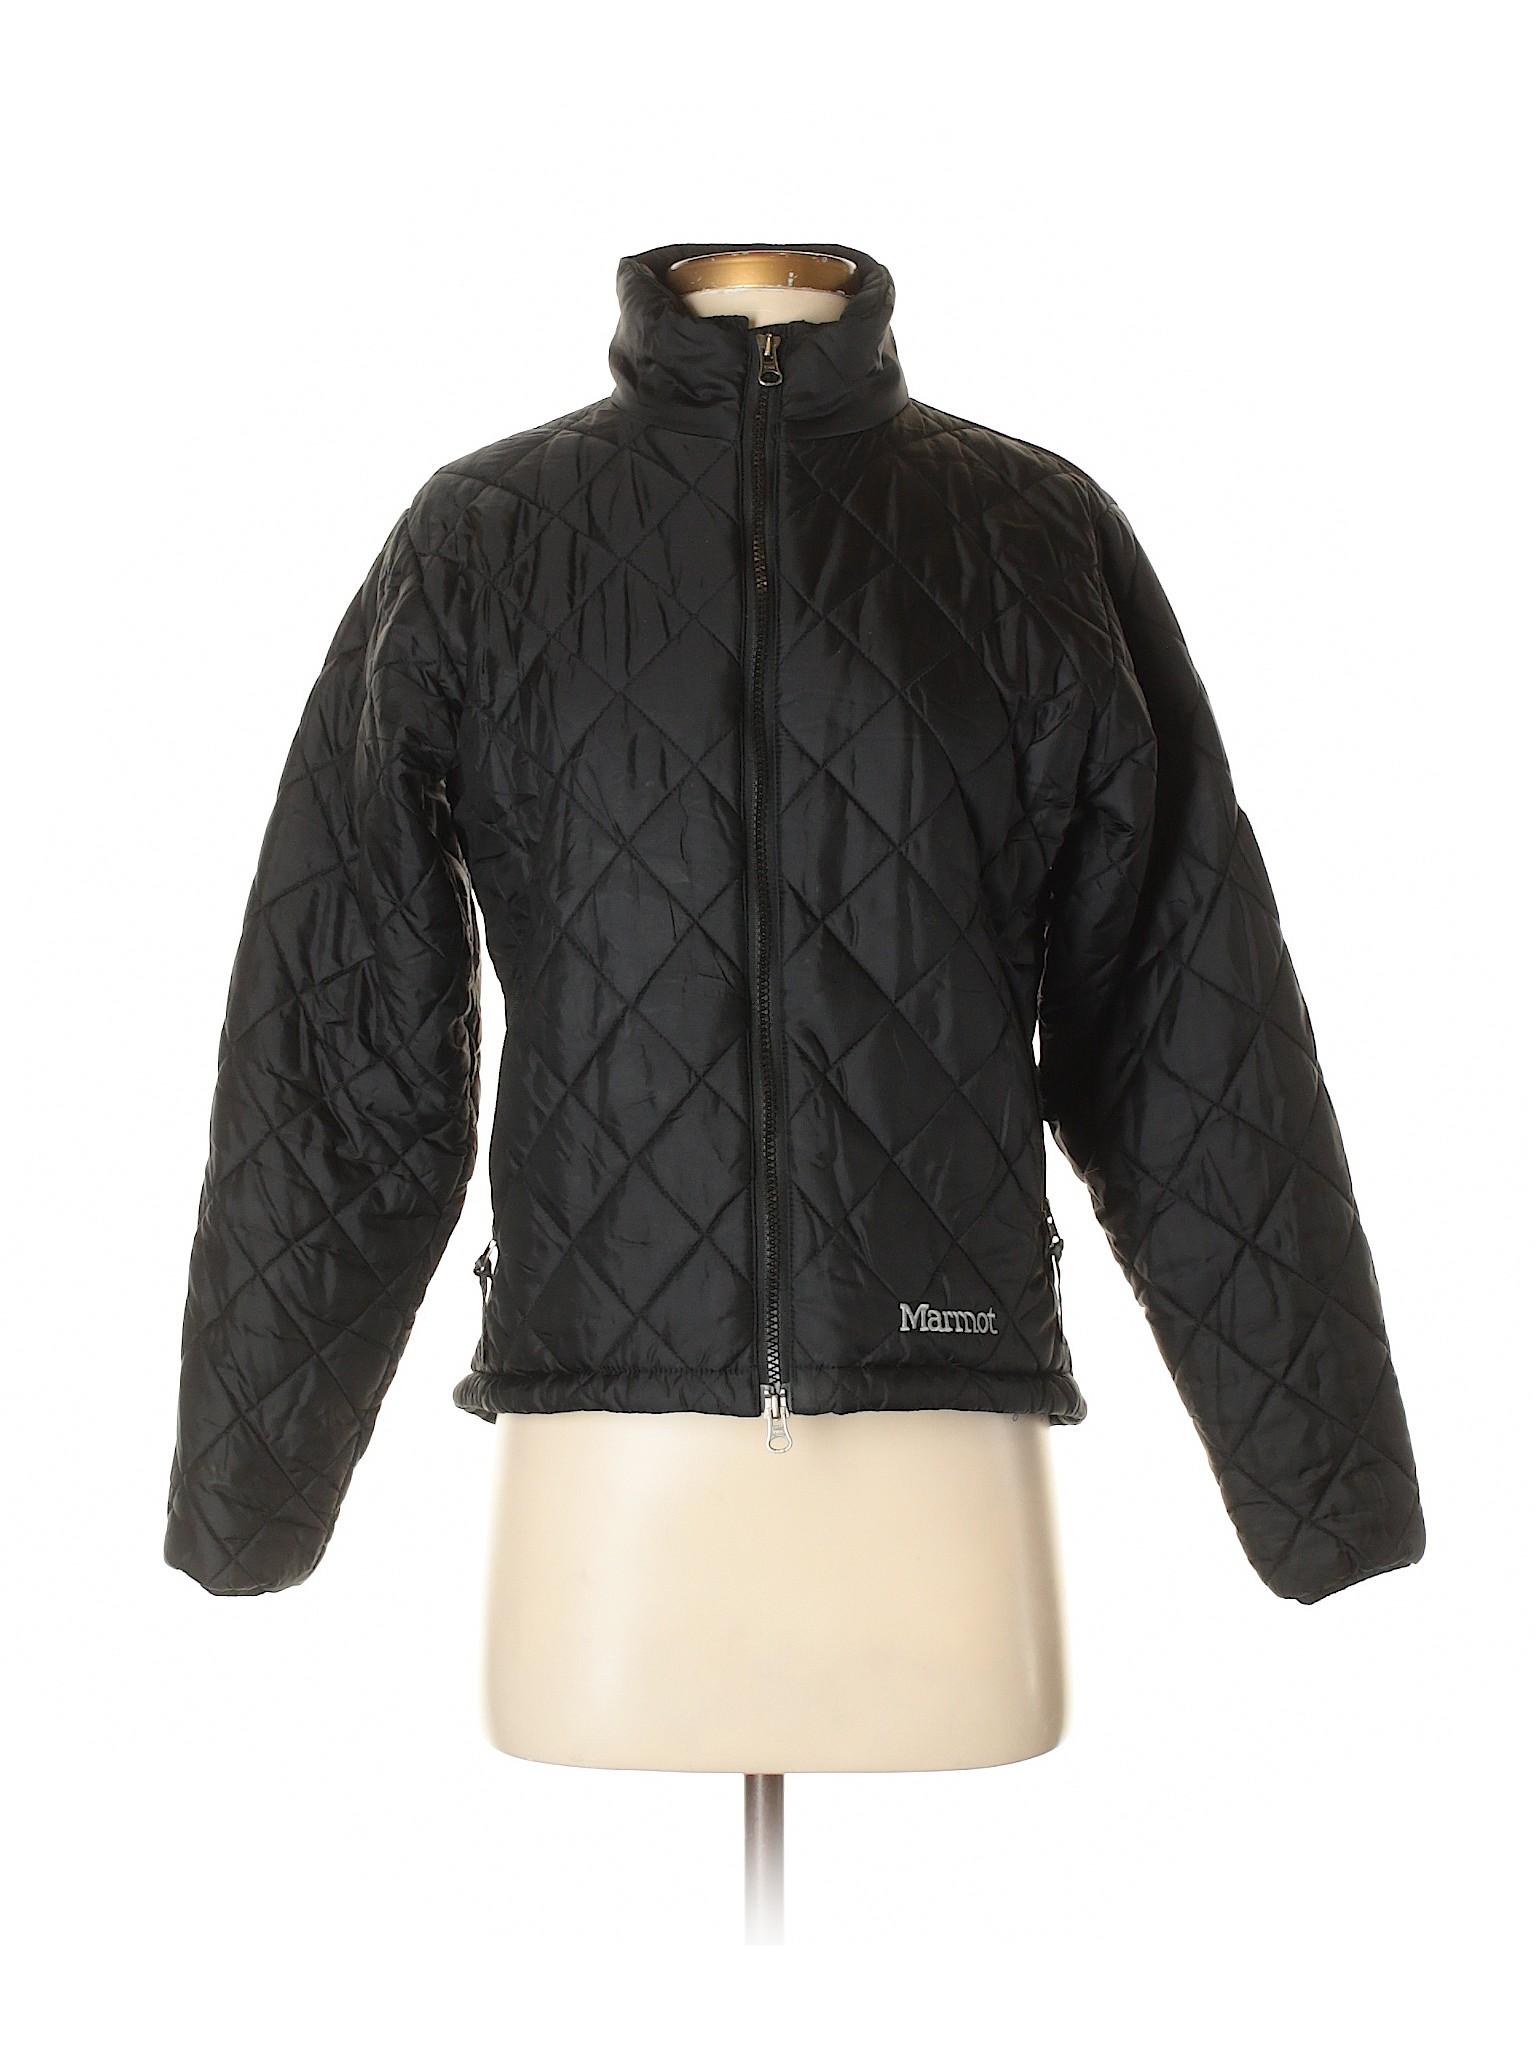 Jacket Marmot Marmot Jacket winter winter Leisure Leisure dvnfdRF